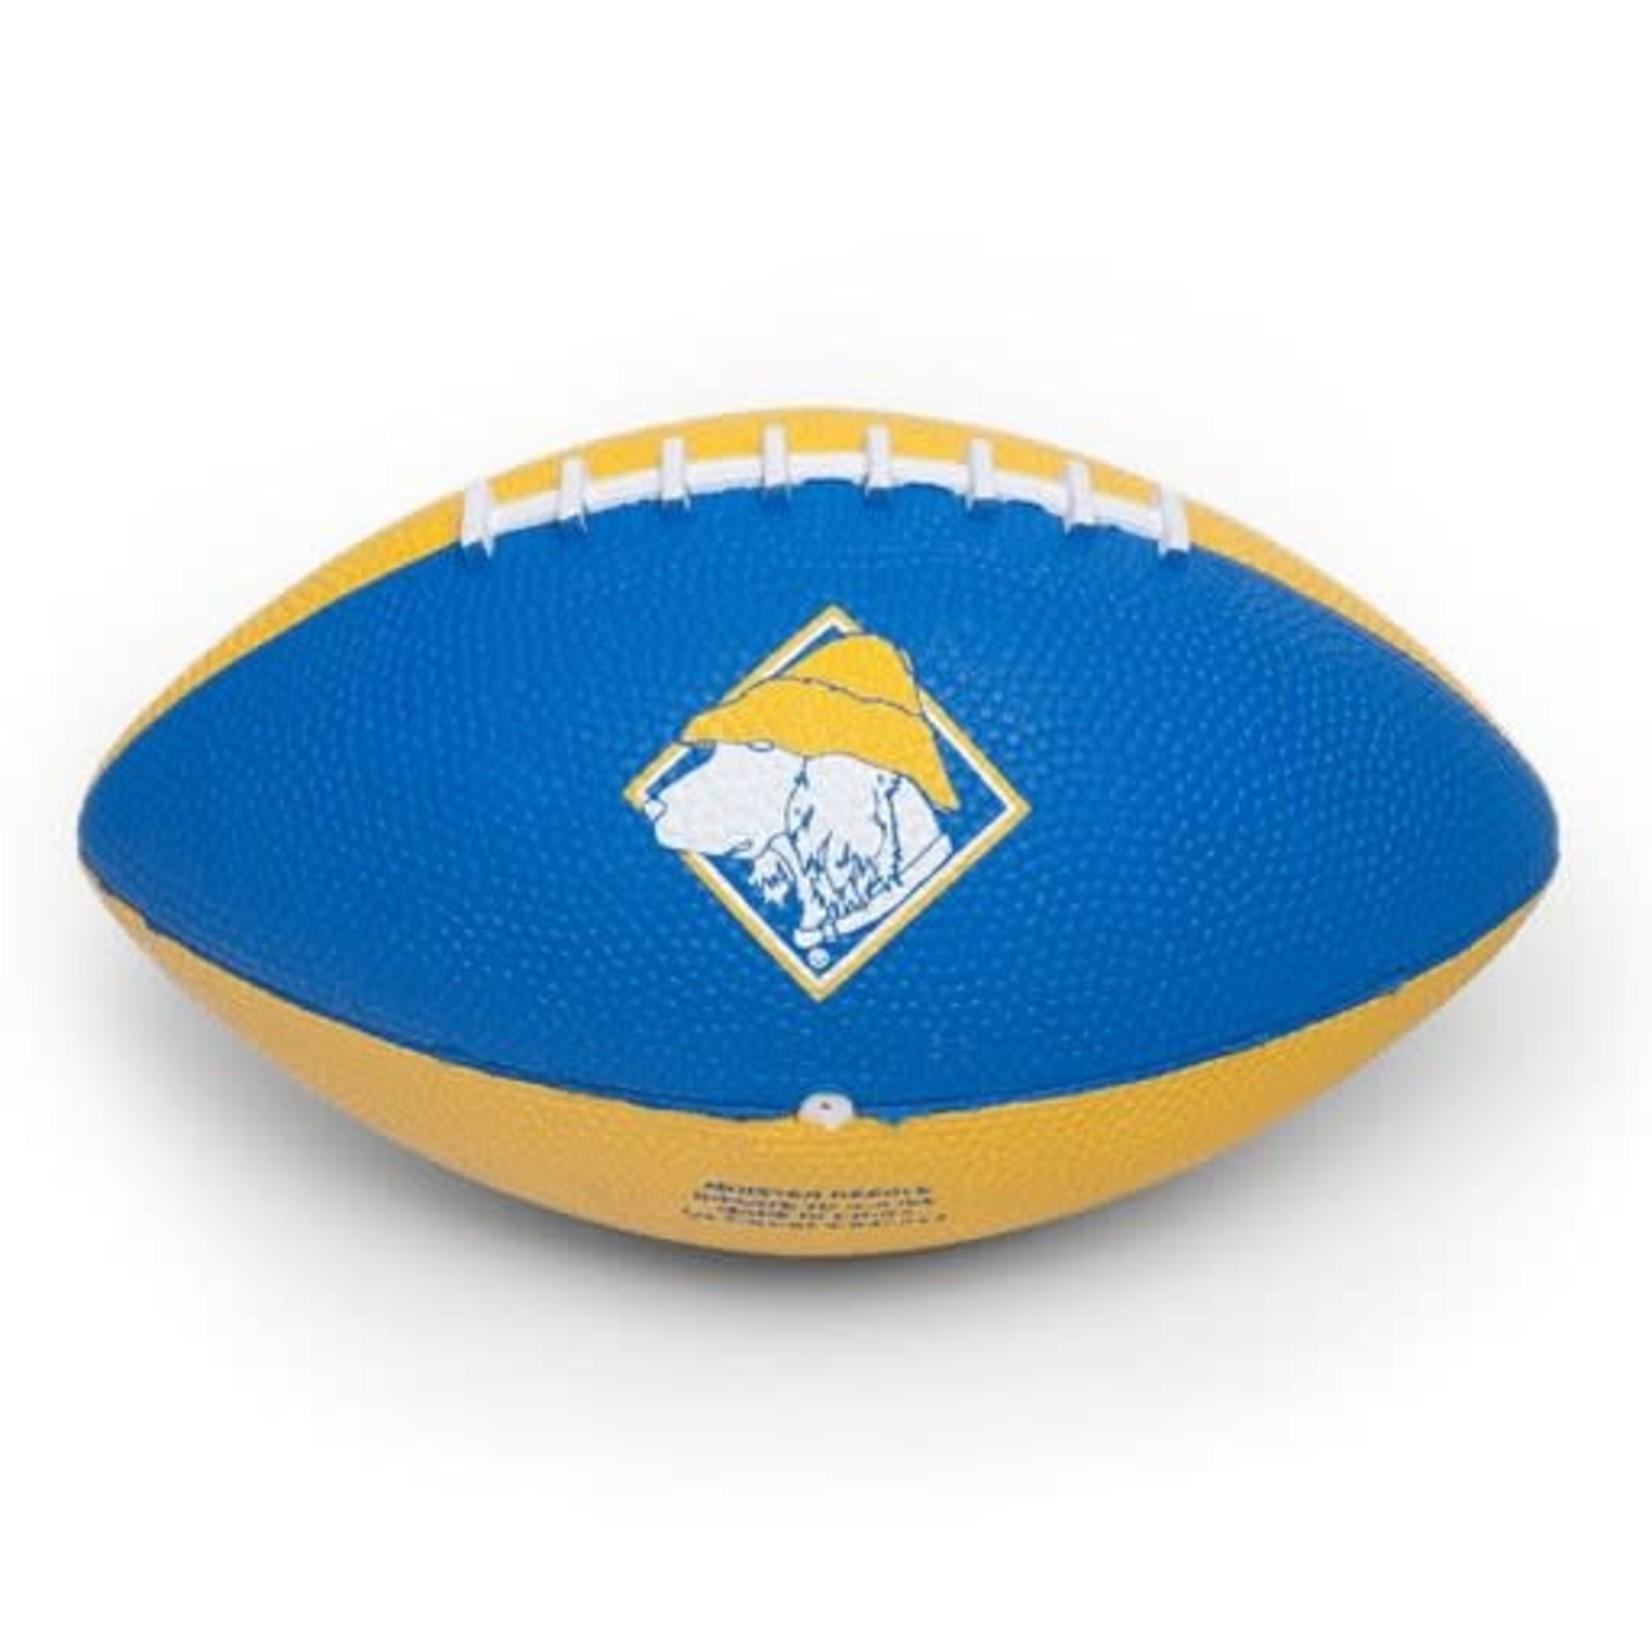 Football - Blue/Yellow - Rubber